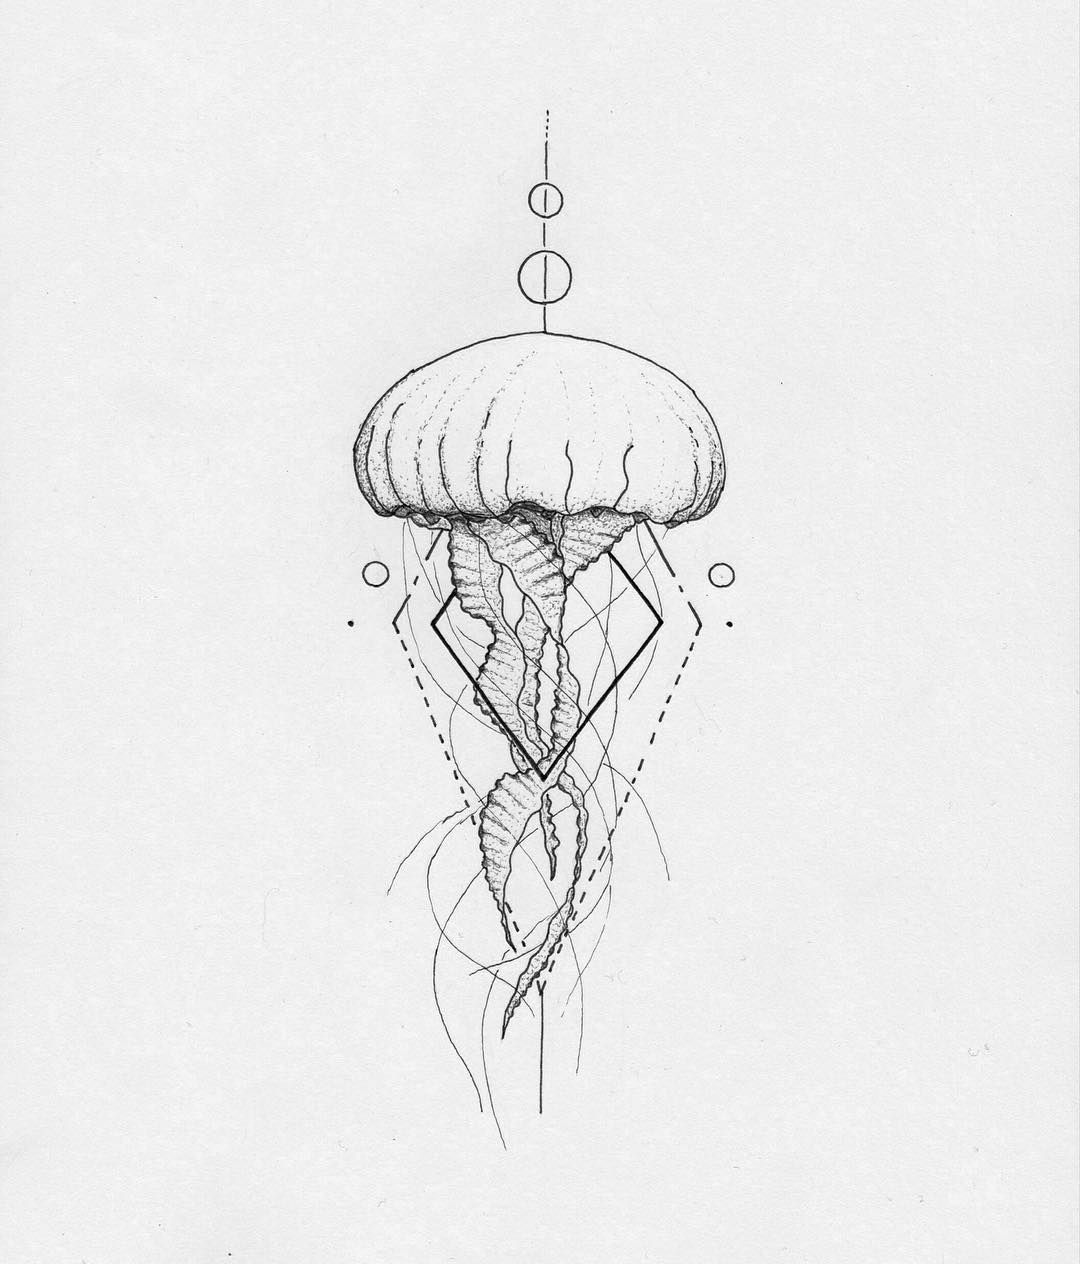 Uncategorized Jelly Fish Drawing consulta esta foto de instagram arleycornell 147 me gusta gusta